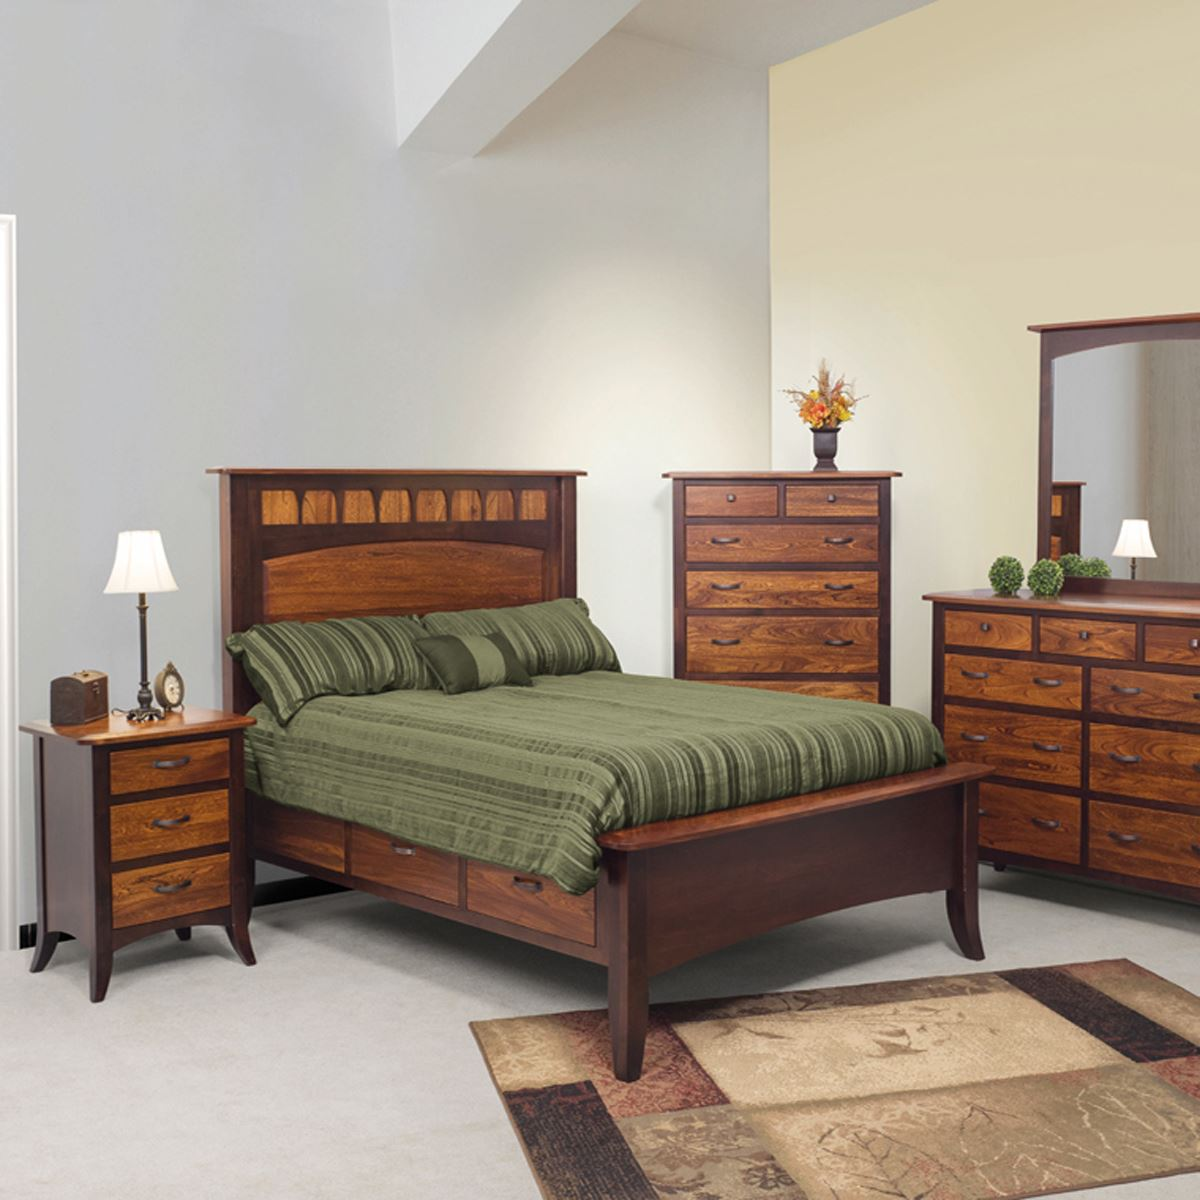 Solid Wood Bedroom Furniture Uk Solid Wood Bedroom Furniture Sets Sale Solid Wood Bedroom